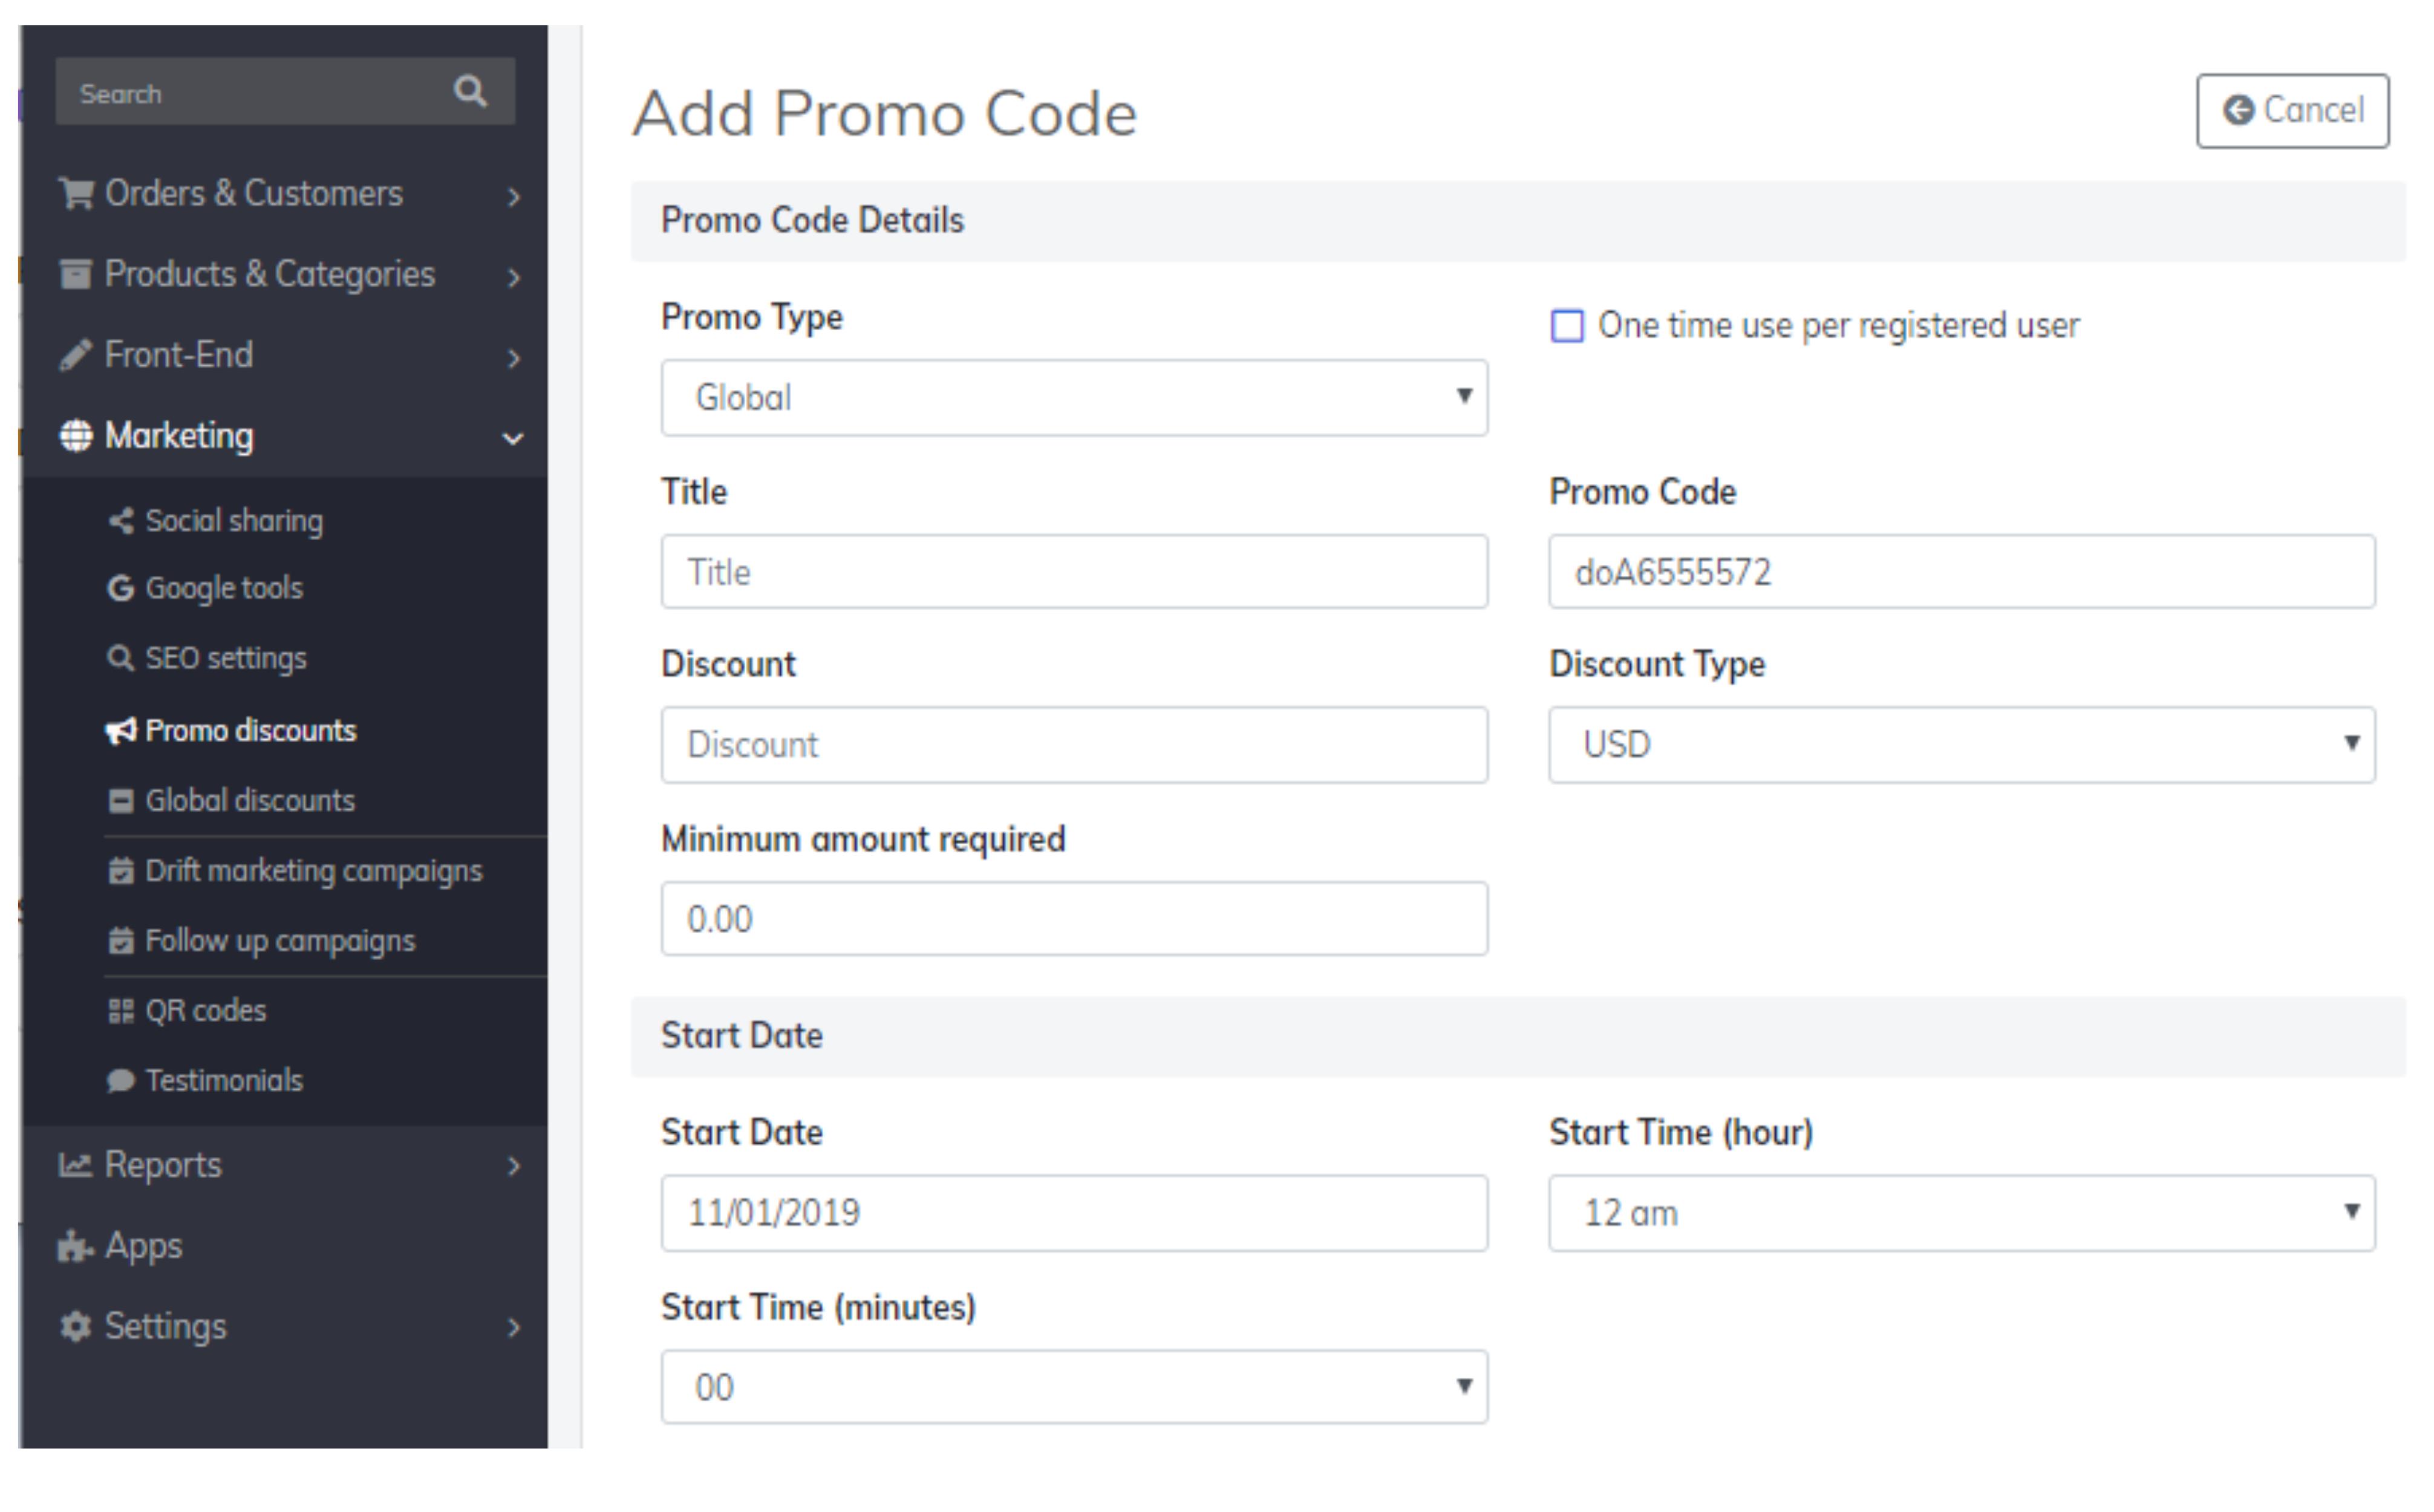 promo-code-details